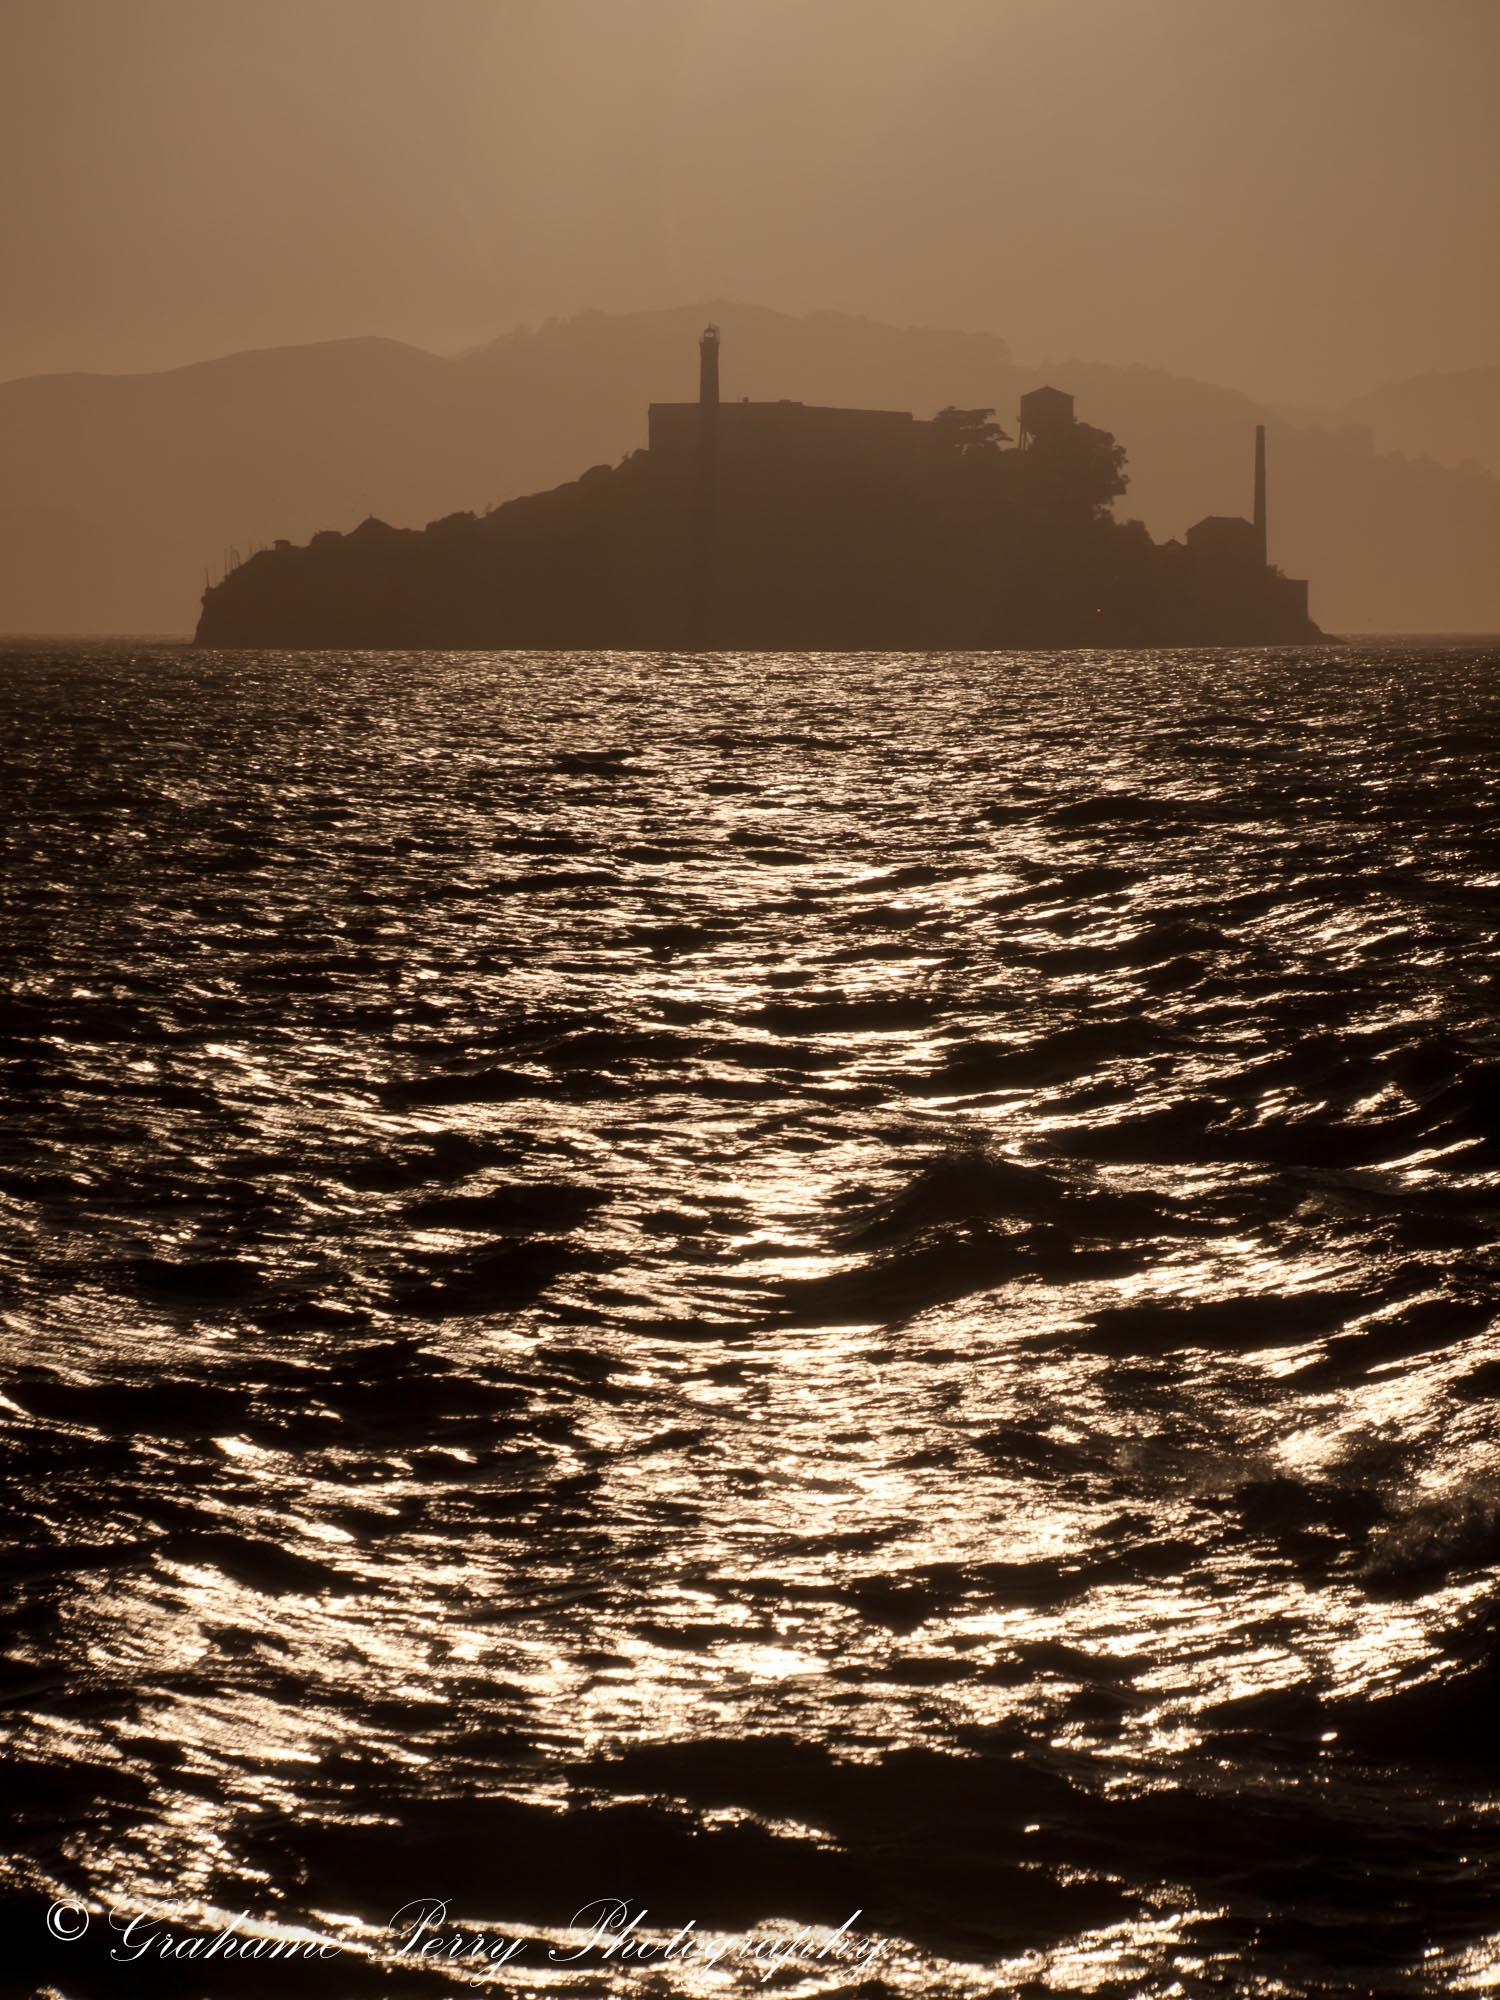 Grahame Perry - 81 Bees - Cliche - Alcatraz.jpg